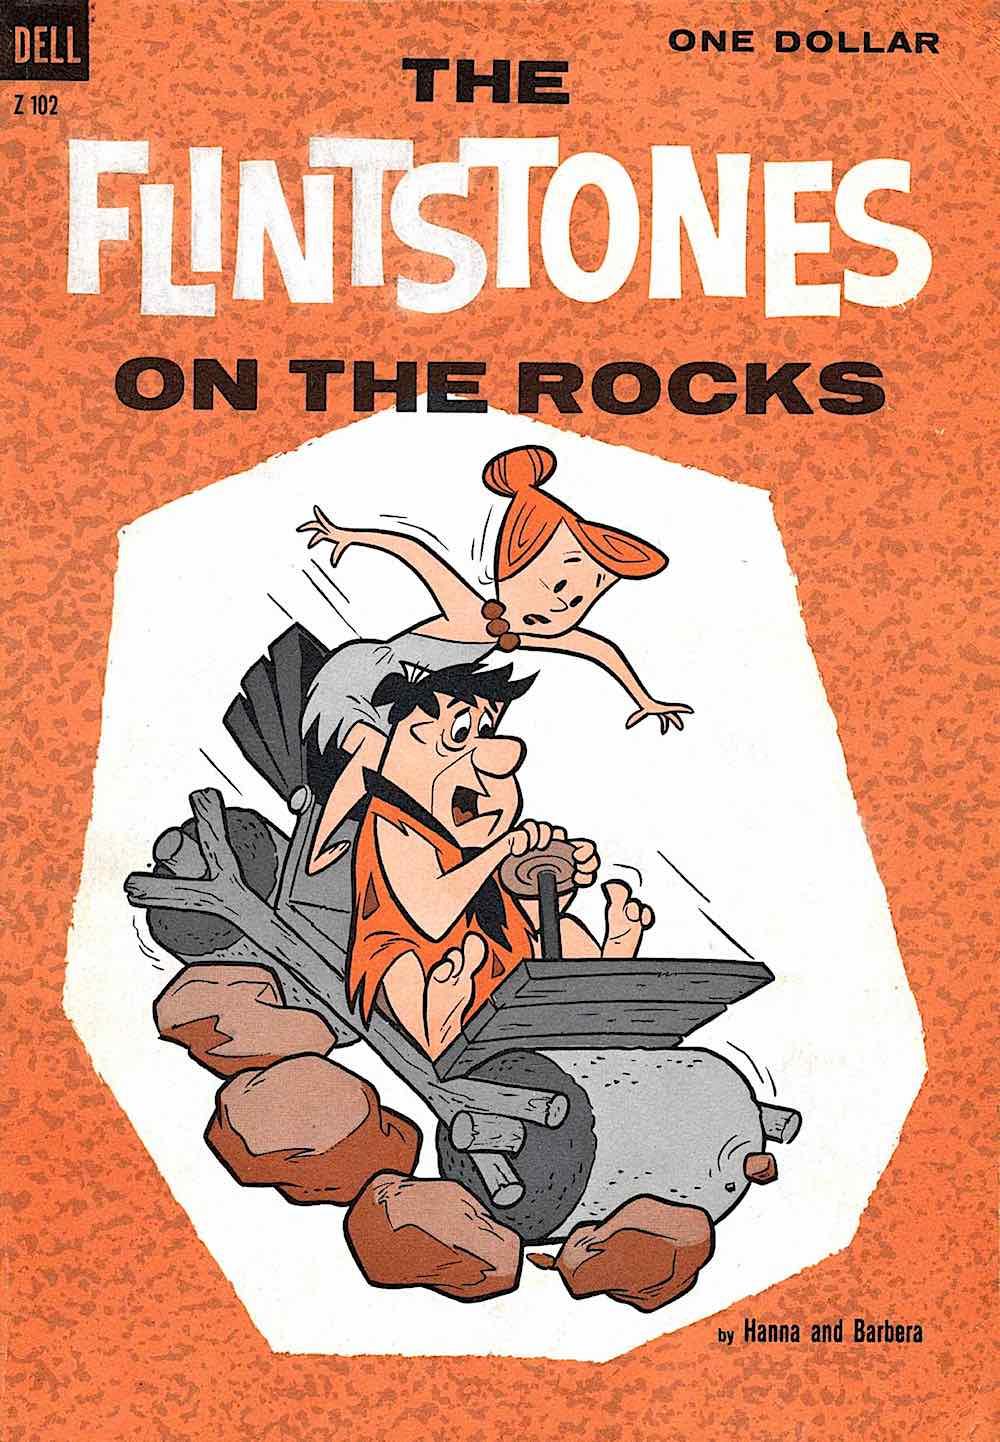 Dell Comics 1961 The Flintsones On The Rocks